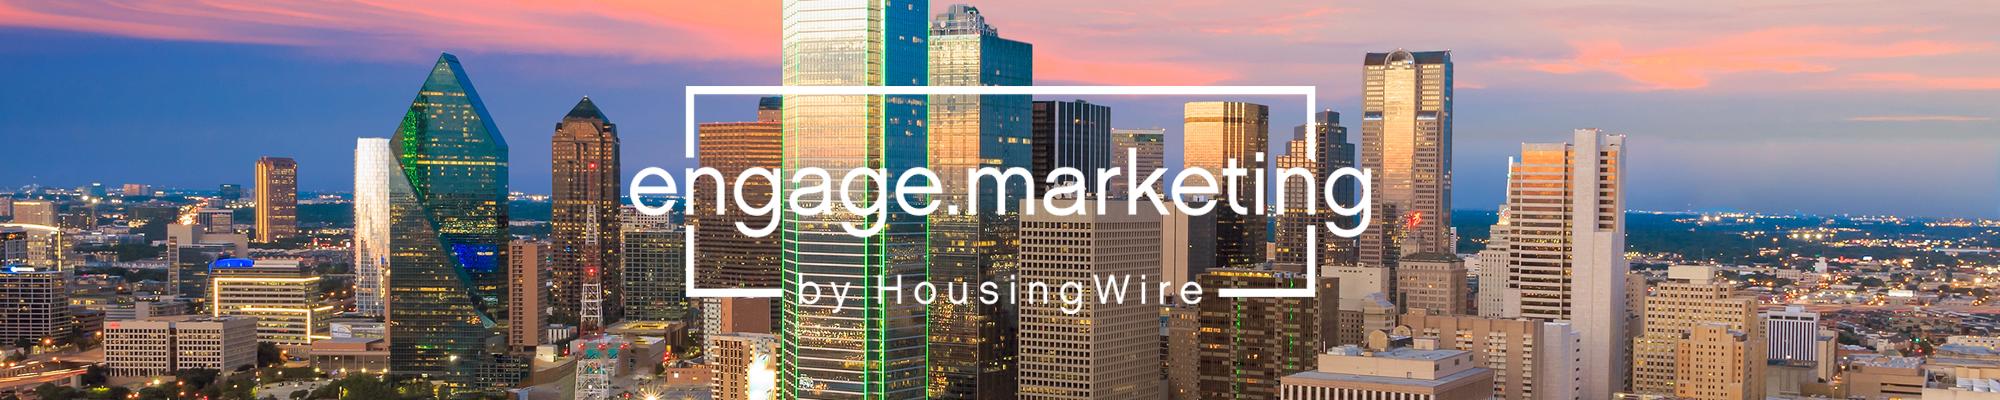 engage.marketing-HS-RegistrationPage